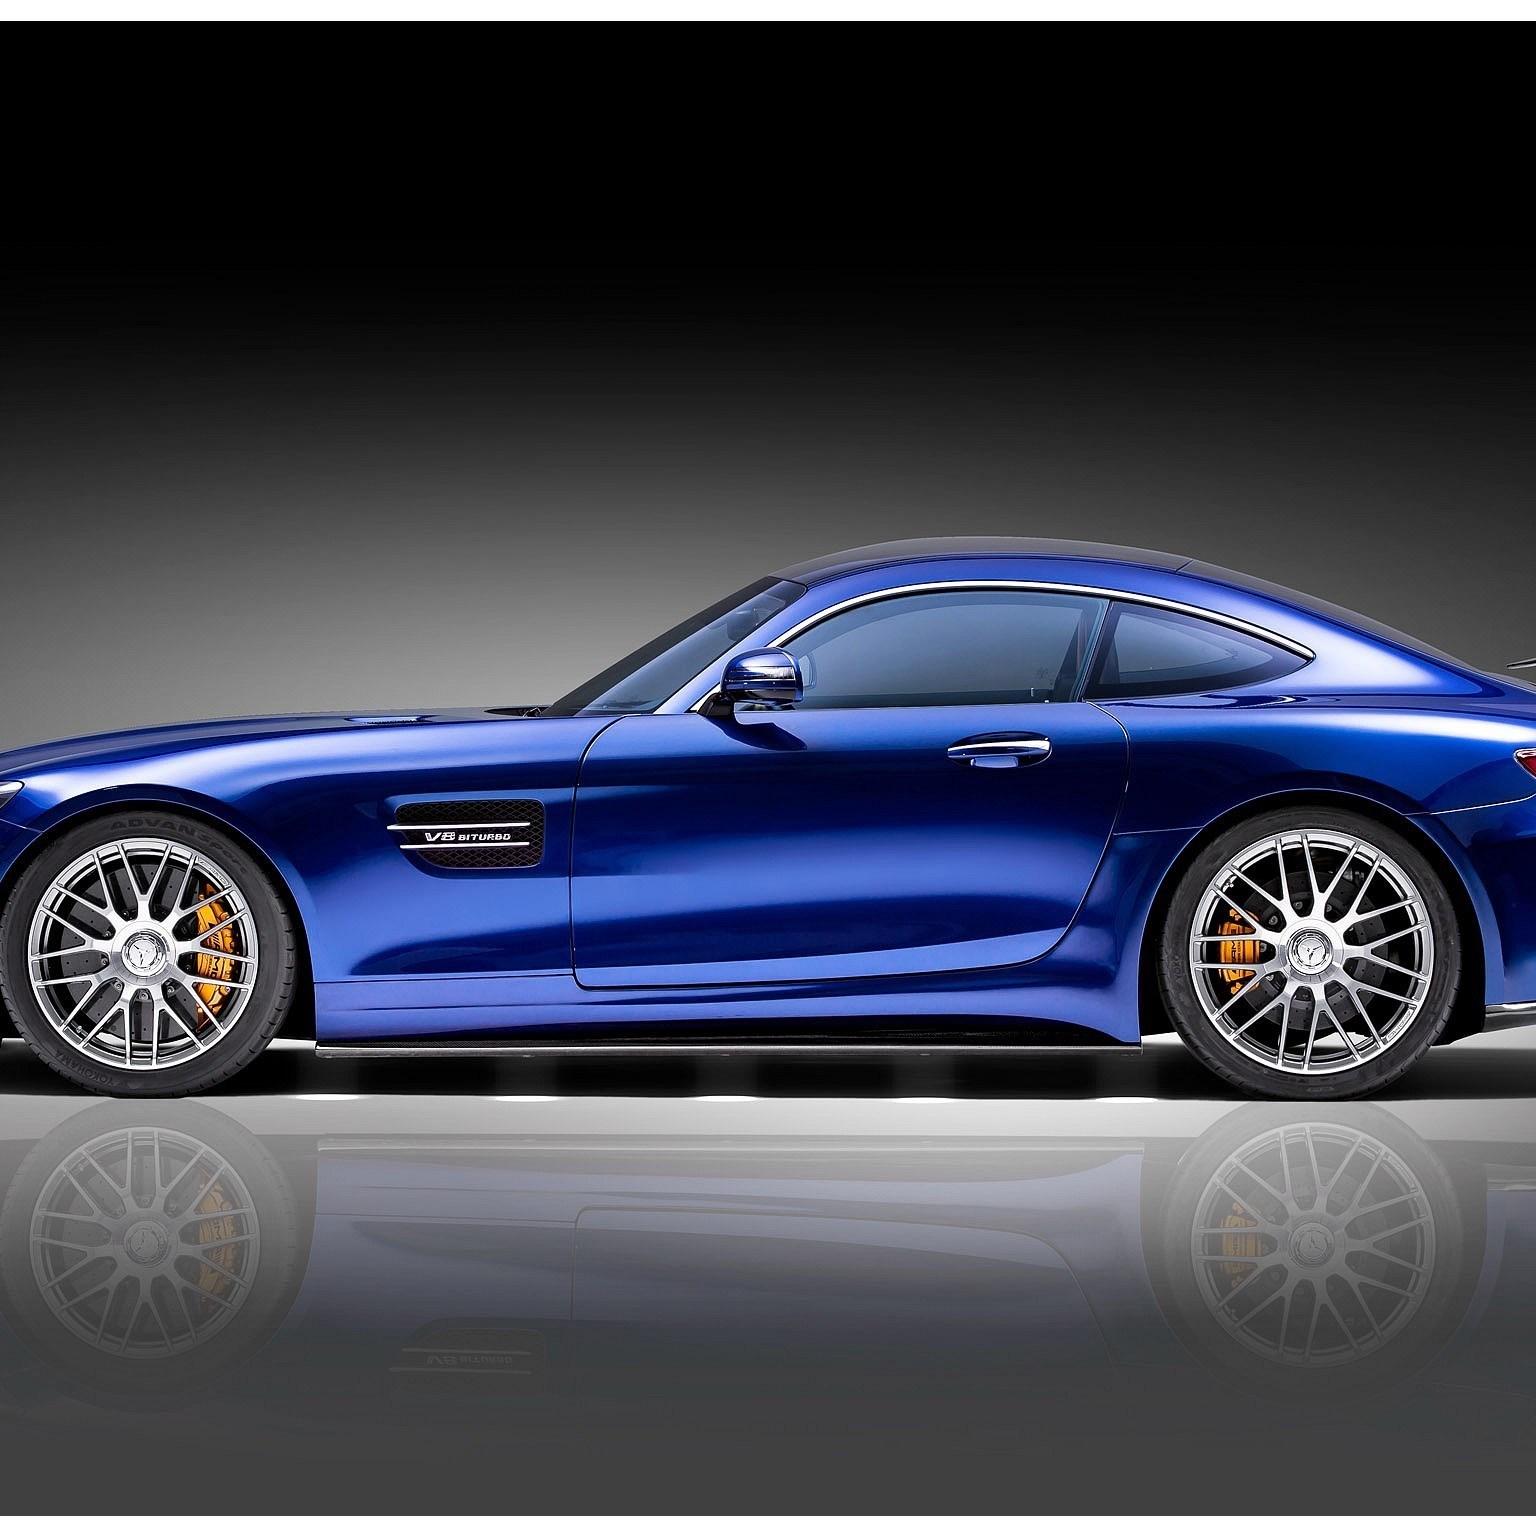 2016 Piecha Design : AMG Mercedes GT RSR C190